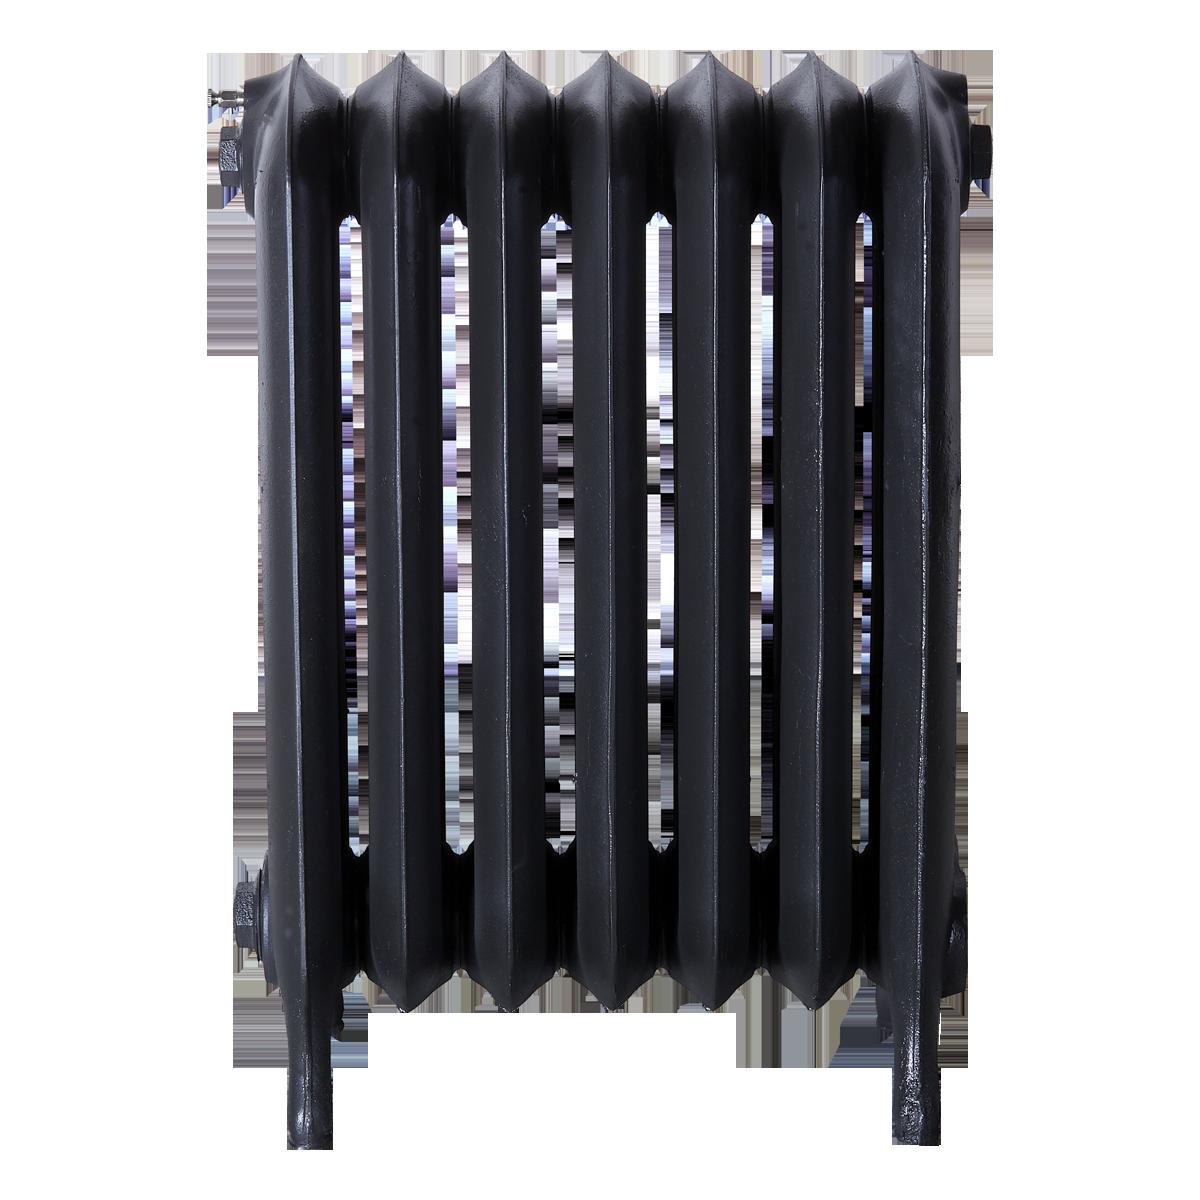 Ironworks Radiators Inc. refurbished cast iron radiator